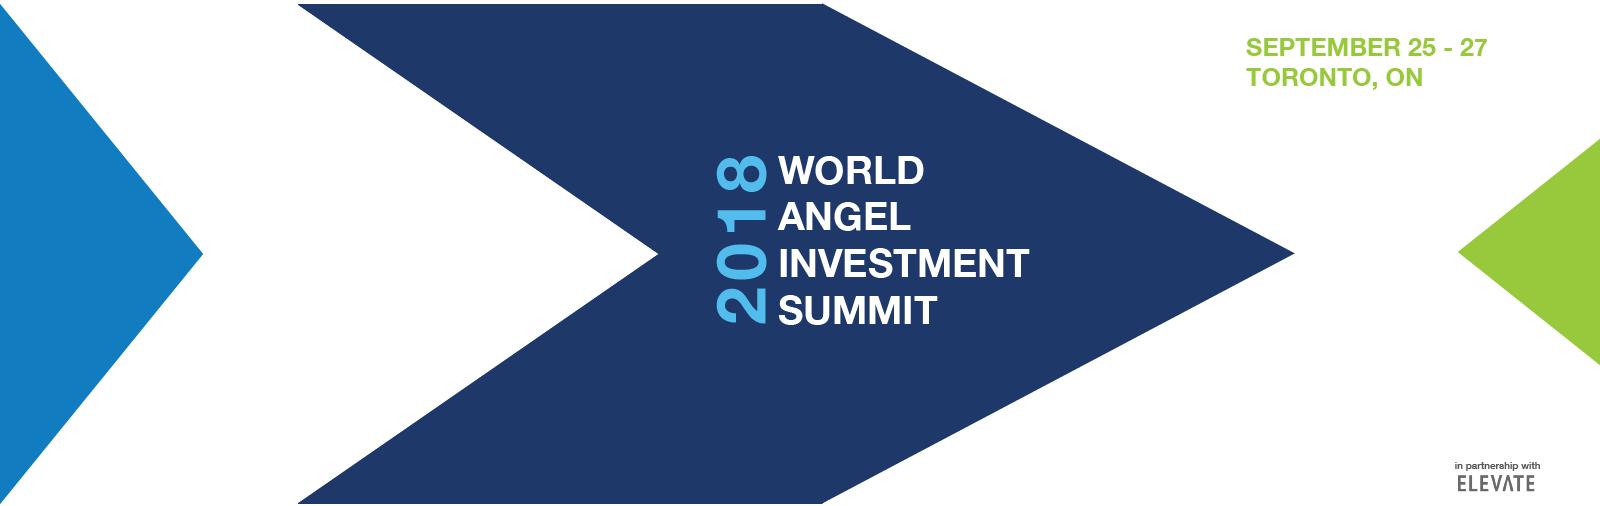 World Summit Image